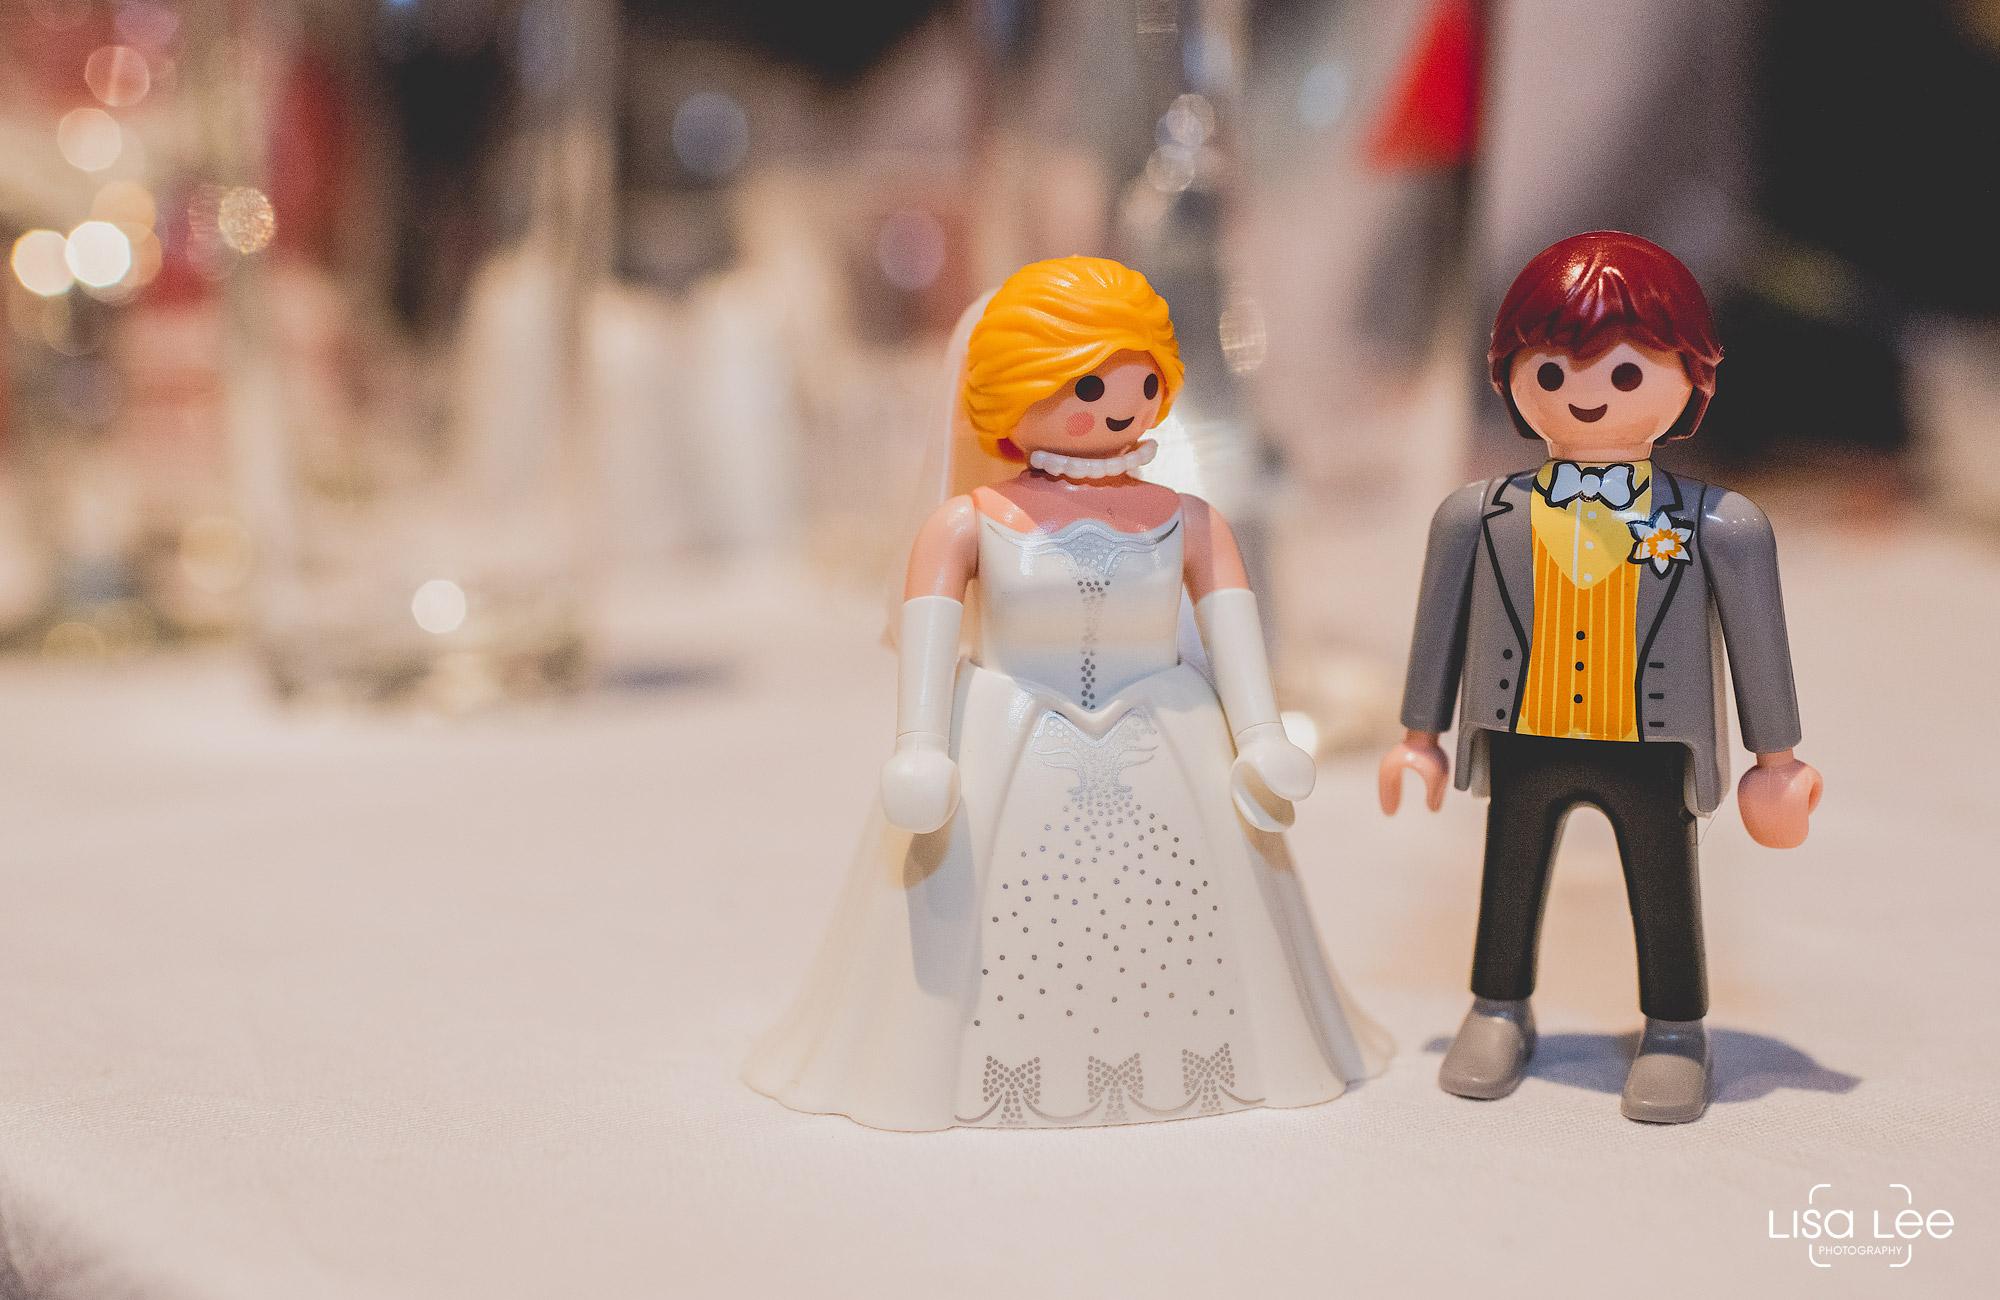 lisa-lee-wedding-photography-burton-playmobile.jpg